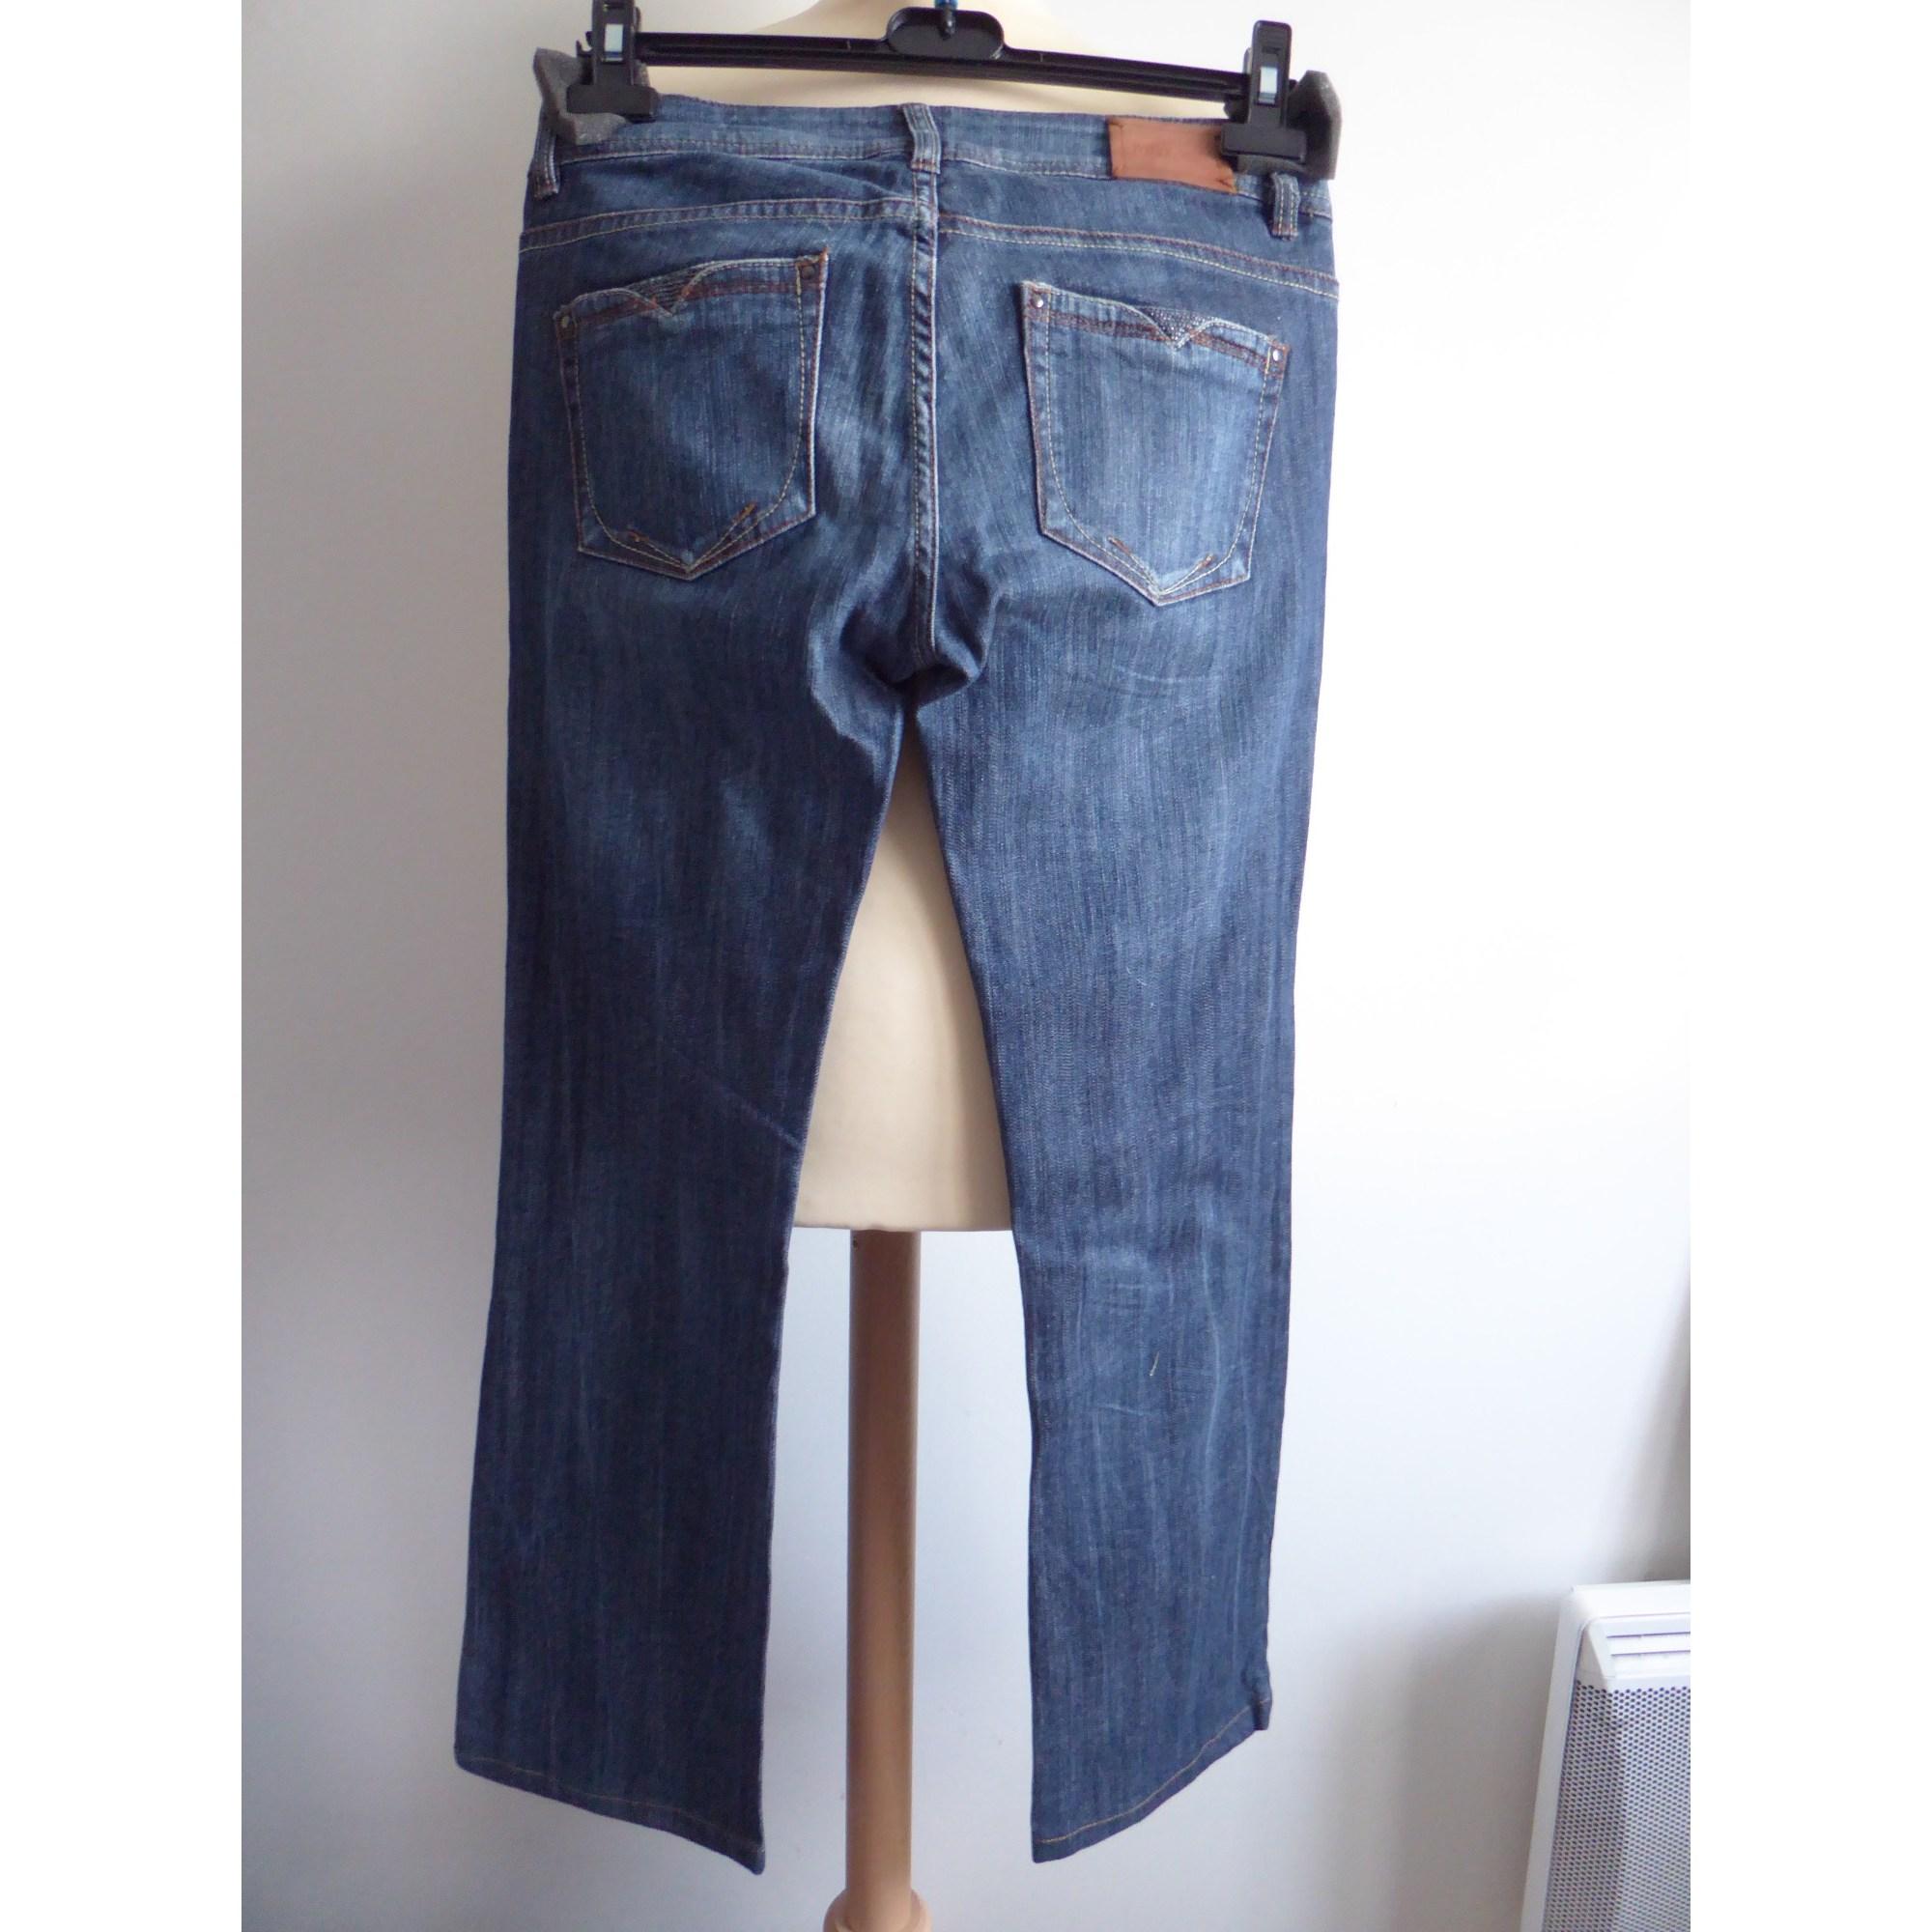 Jeans droit MKT Bleu, bleu marine, bleu turquoise